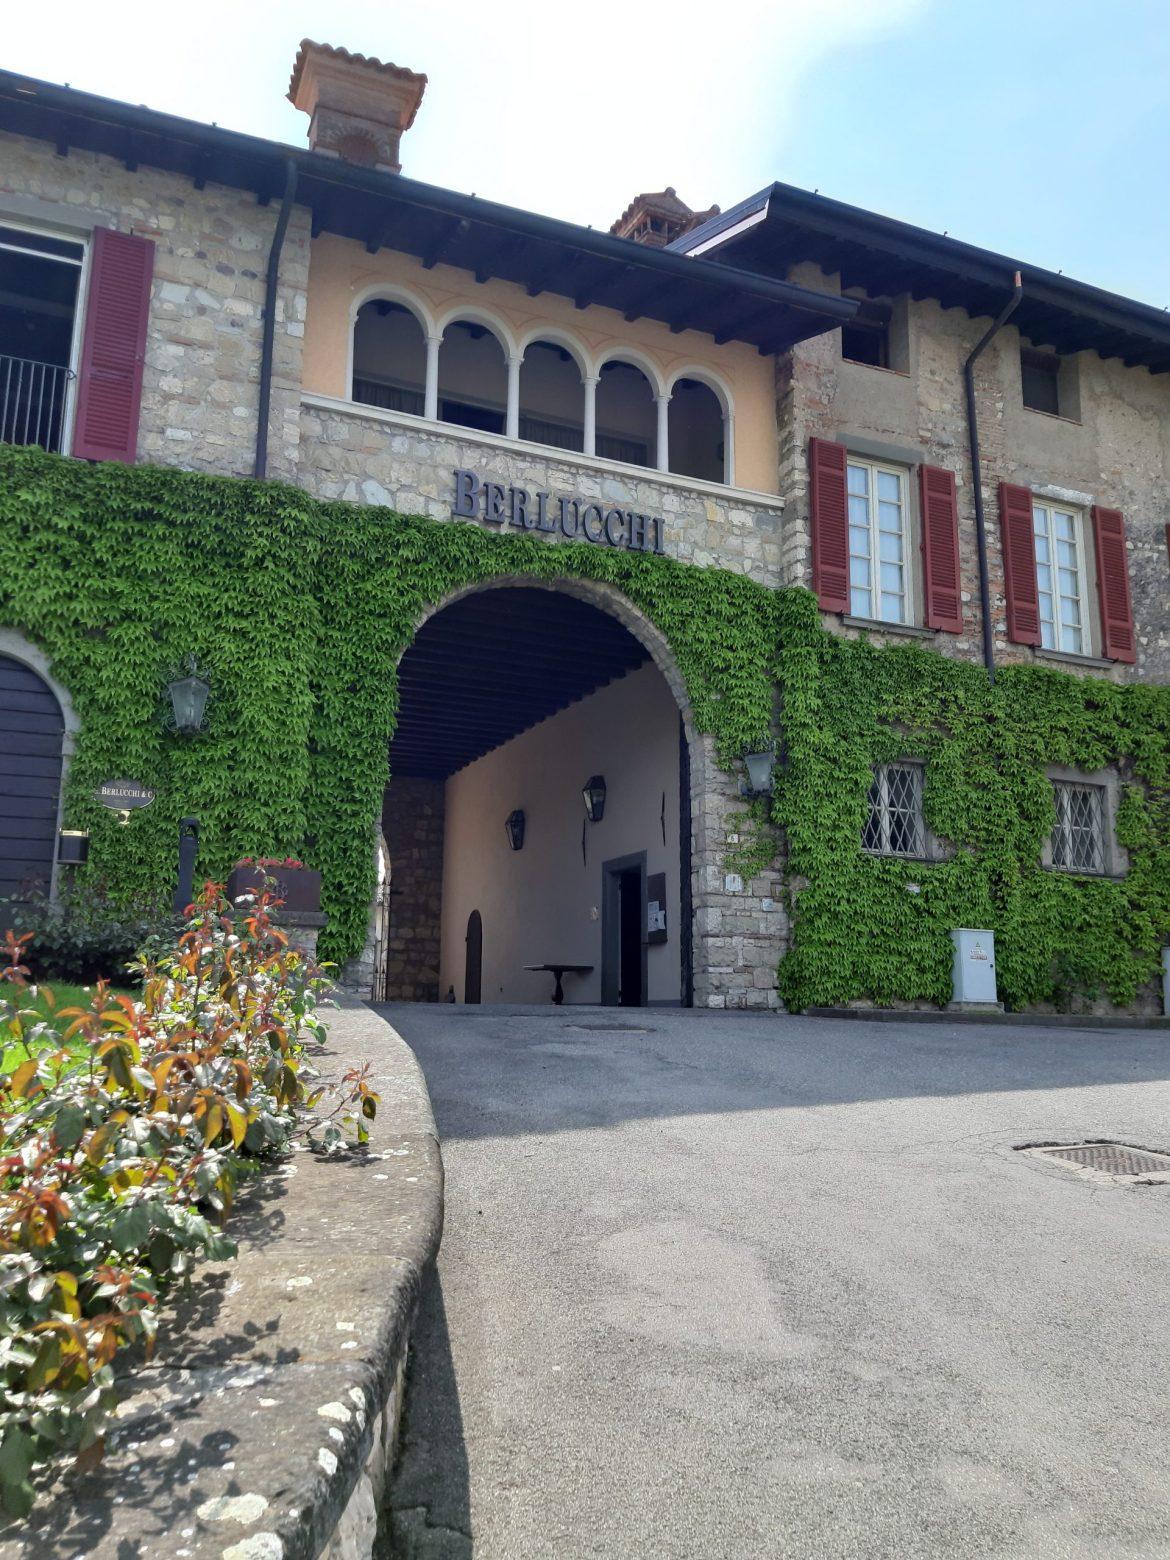 Vinícola Berlucchi fachada, empresa histórica